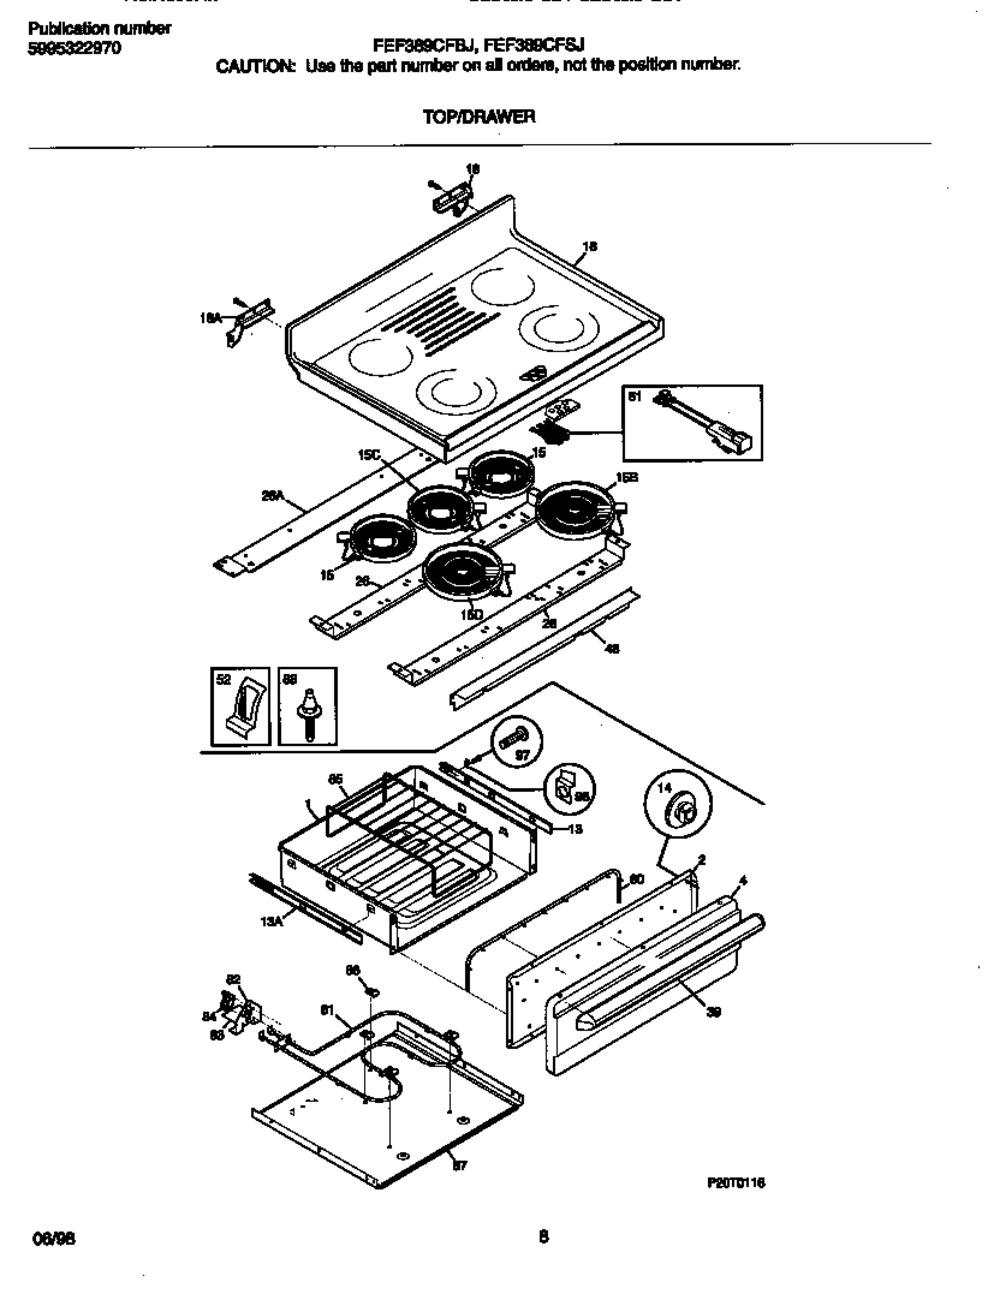 Diagram for FEF389CFSJ